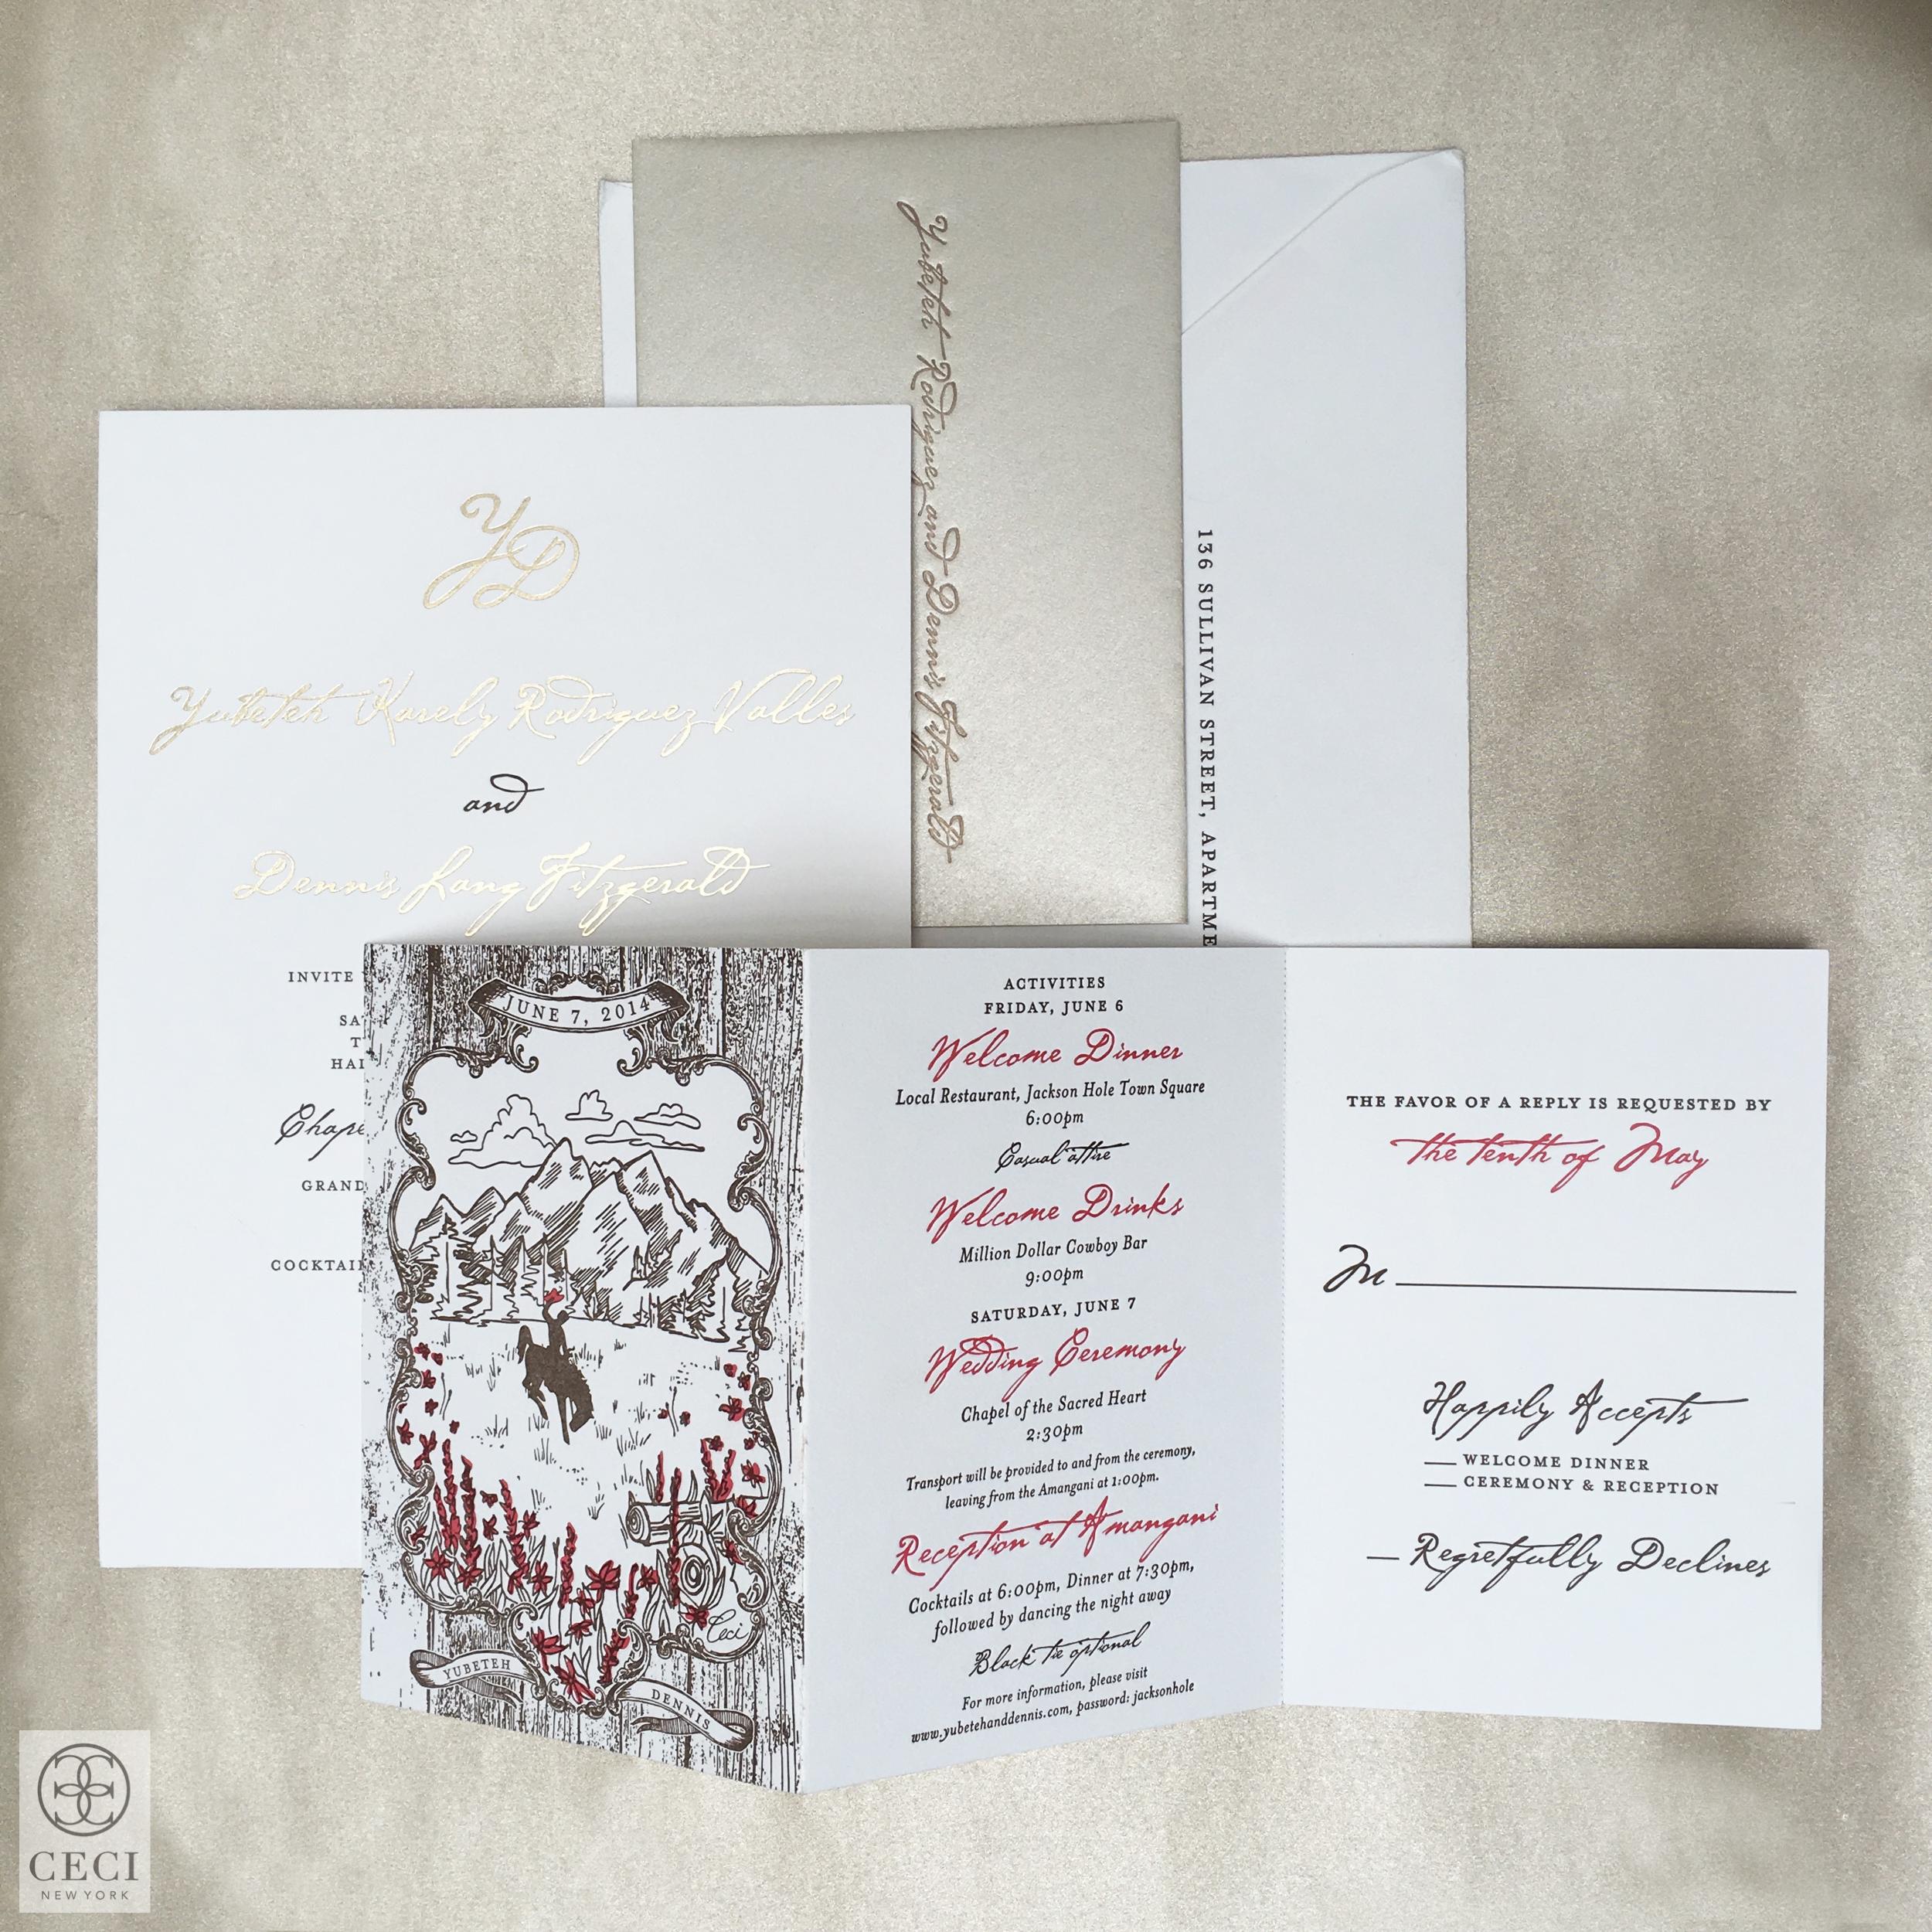 Ceci_New_York_Lyndsey_Hamilton_Events_Invitations_Wedding_Amangani_Elegance_Gold_Foil_Letterpress_Classic_Stamping_Custom_Couture_Personalized-26.jpg